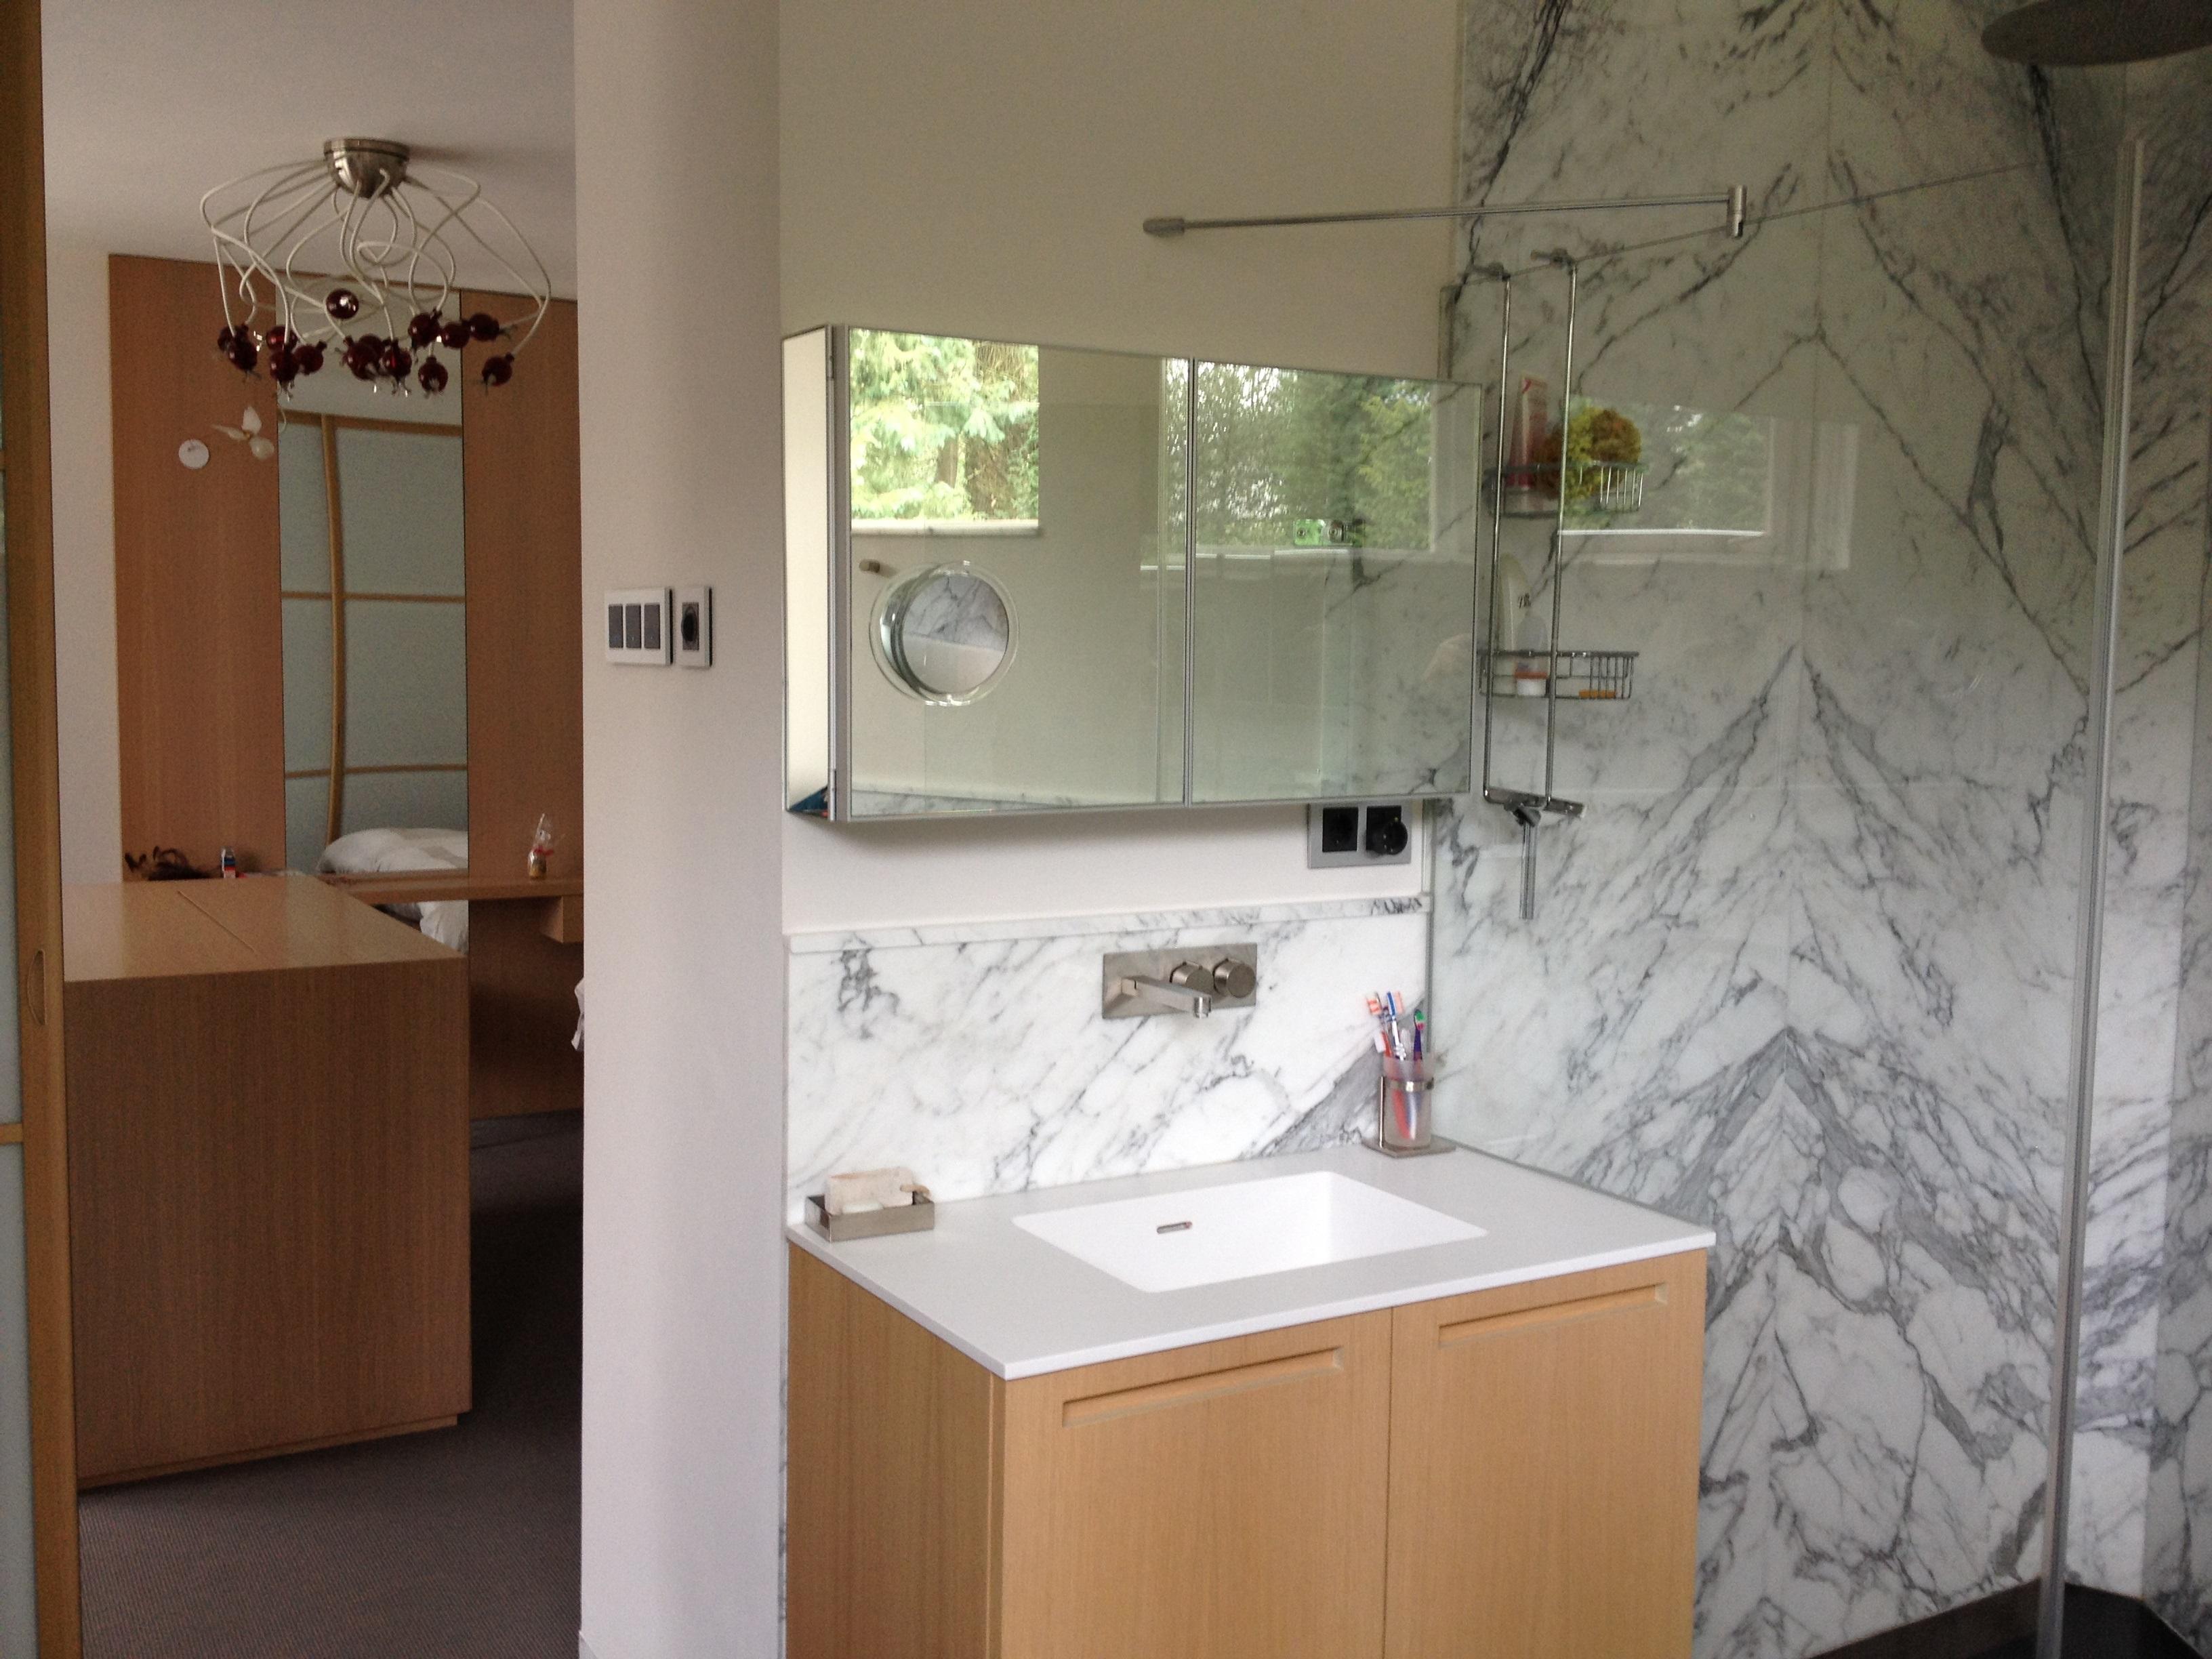 Luxe Badkamer Amsterdam : Badkamer grachtenpand amsterdam ufa bouw